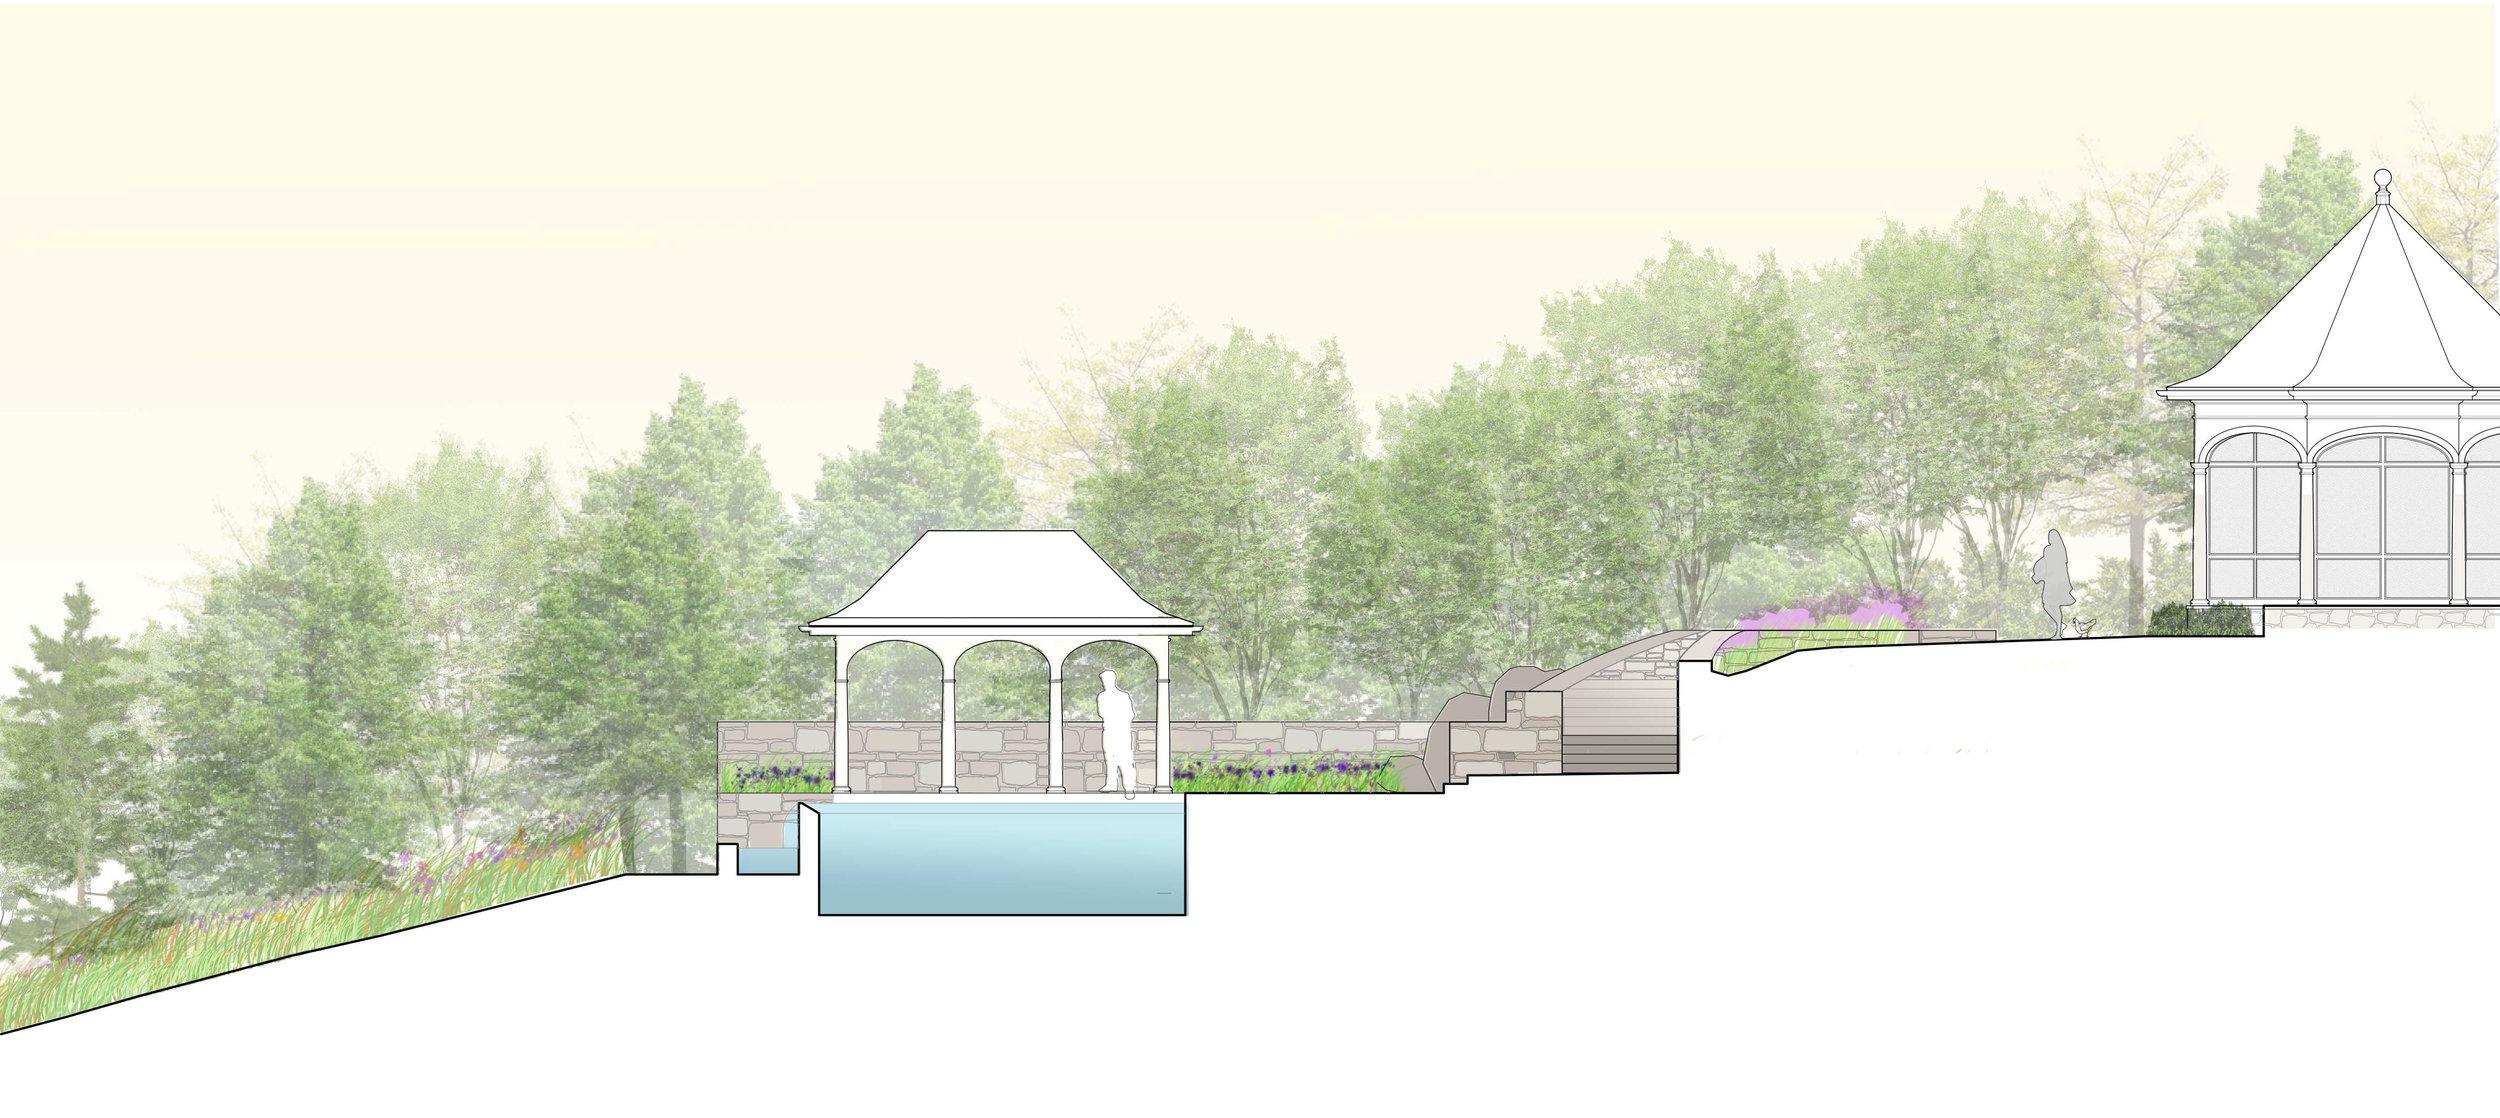 Section2-Grounded_charlottesville-landscape-architect.jpg